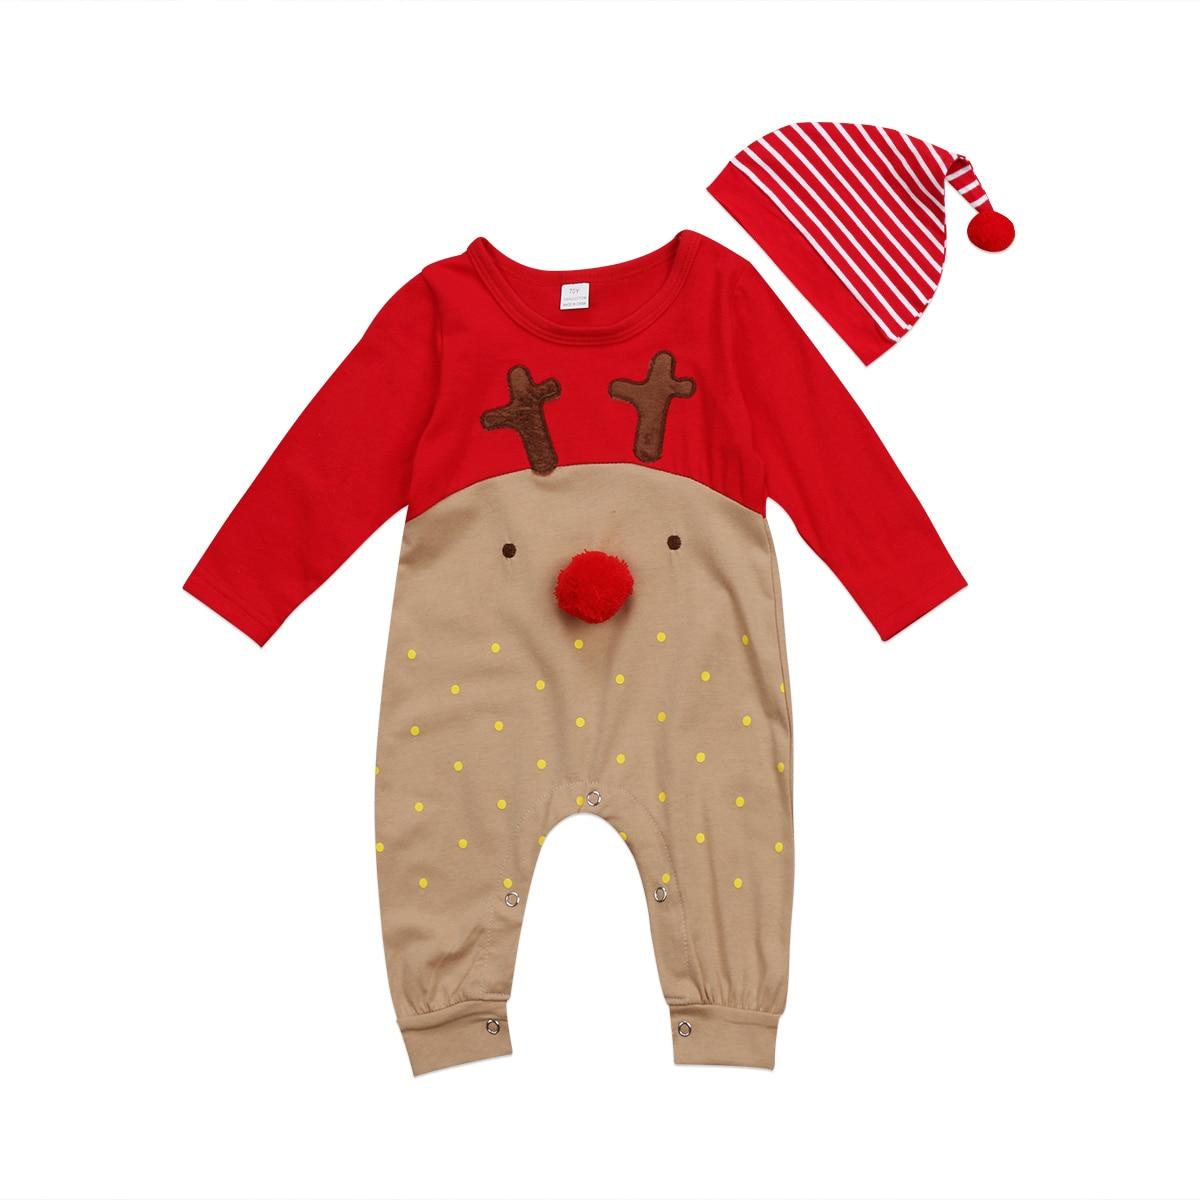 HTB1yvykXvjsK1Rjy1Xaq6zispXau 2Pcs Newborn Baby Boys Girl Christmas Rompers Long Sleeve Deer Romper Jumpsuit Hat Sleepwear Party Costume Baby Clothes